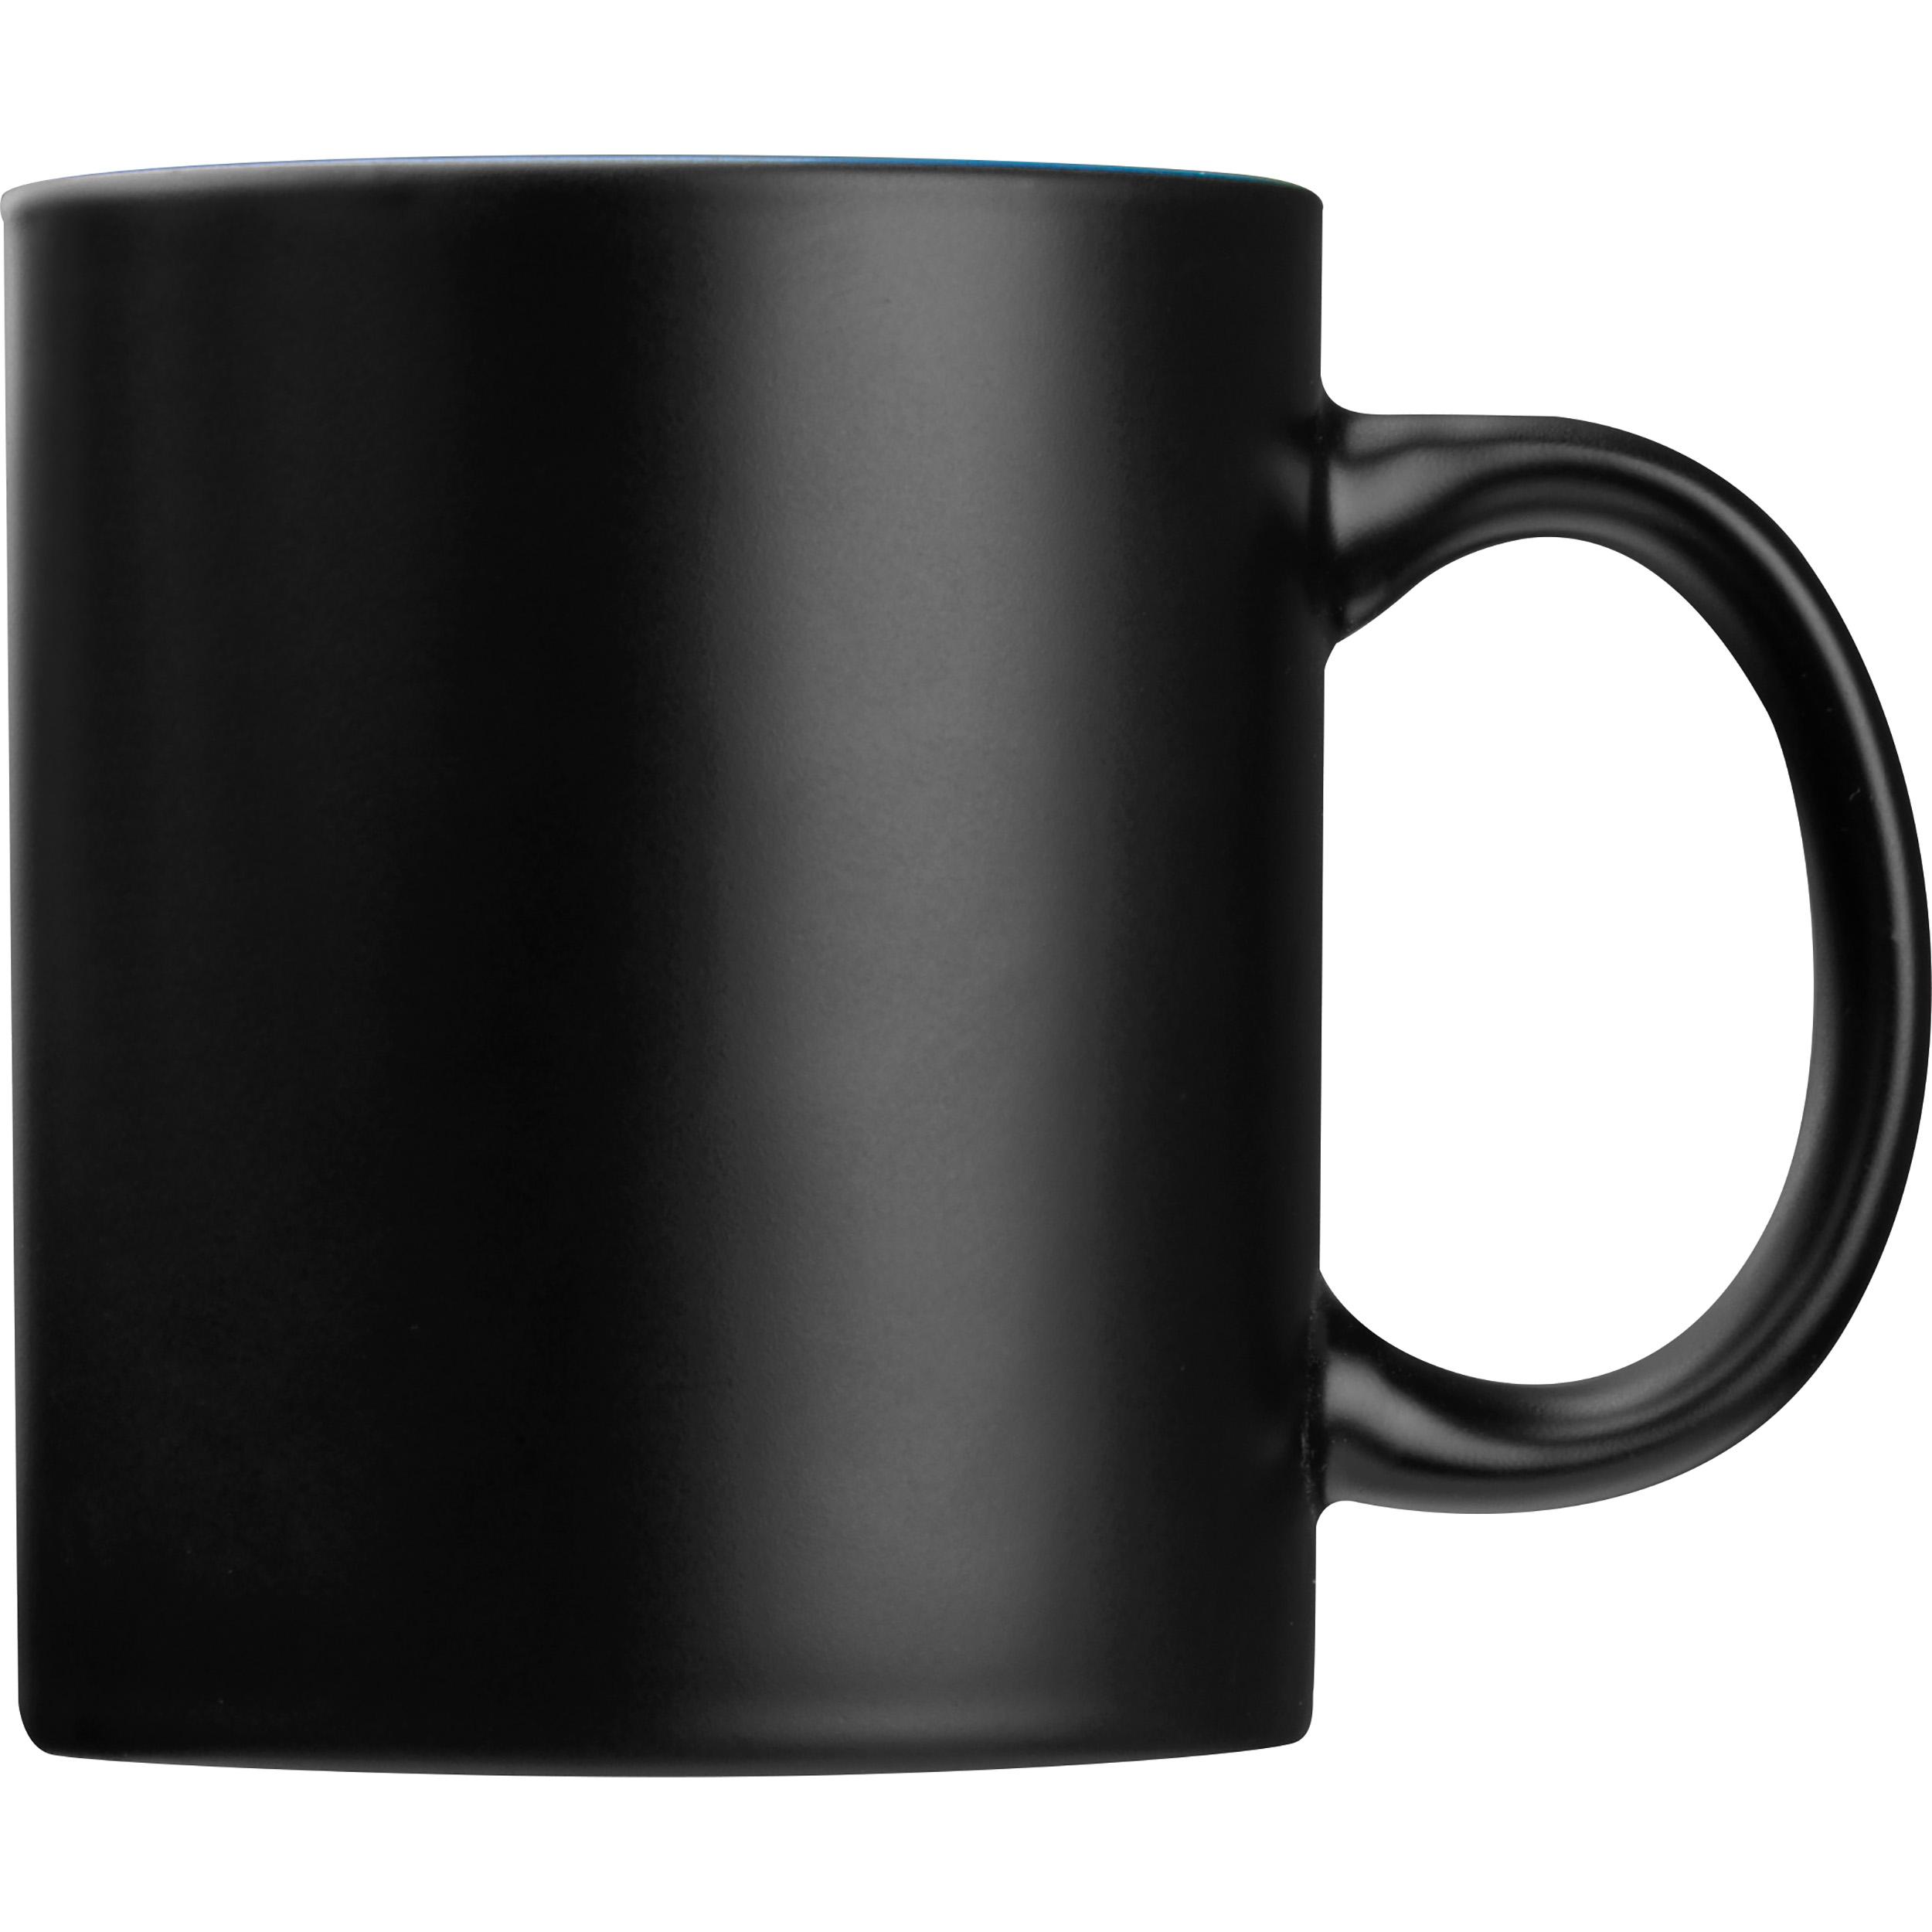 Black mug with colored inside